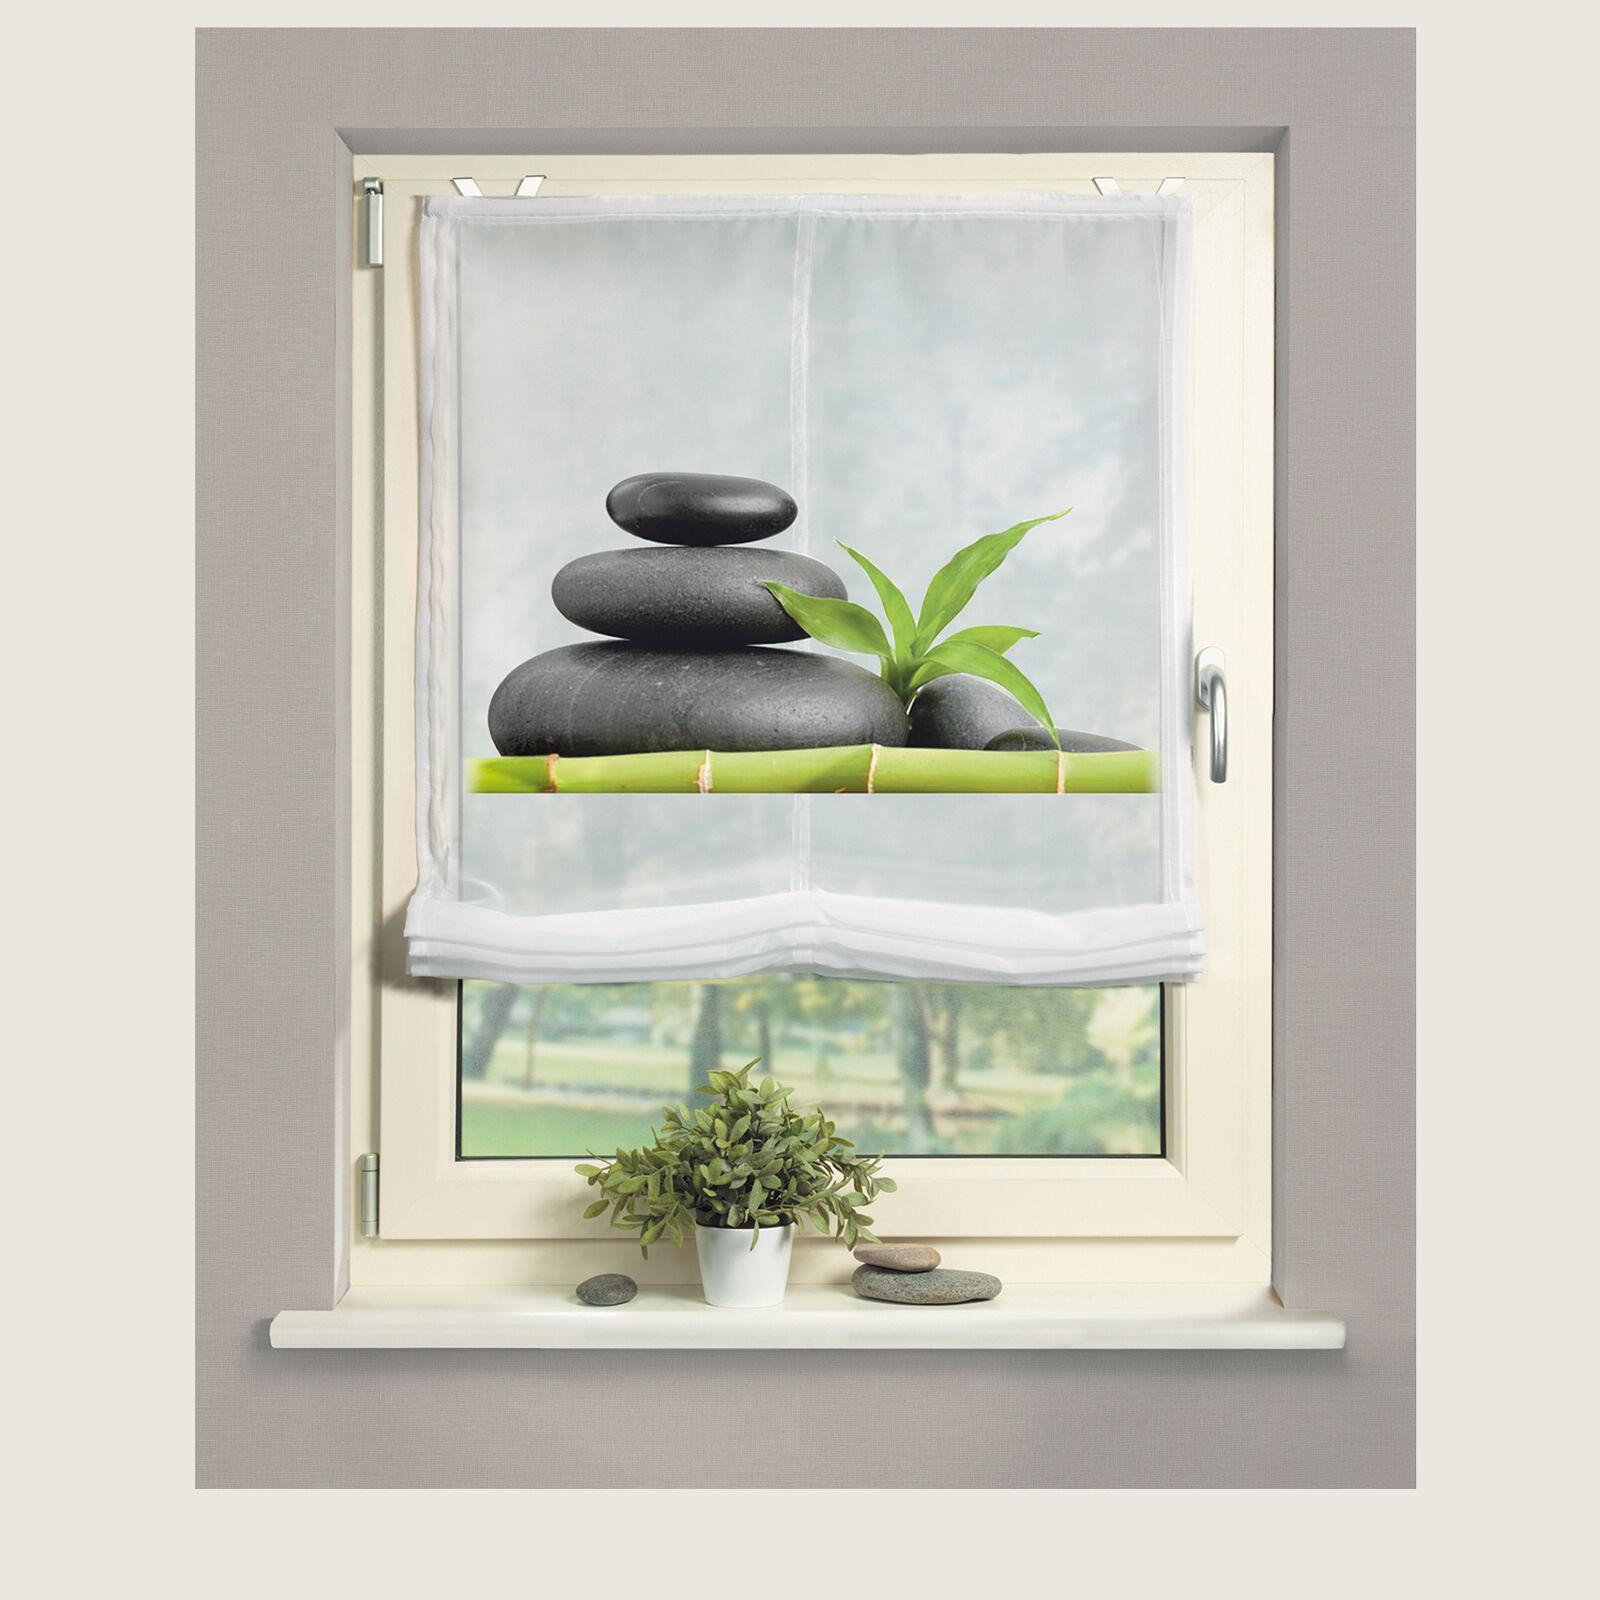 bamboo orchid orchidee bambus digital schiebevorhang raumteiler wellmira ebay. Black Bedroom Furniture Sets. Home Design Ideas